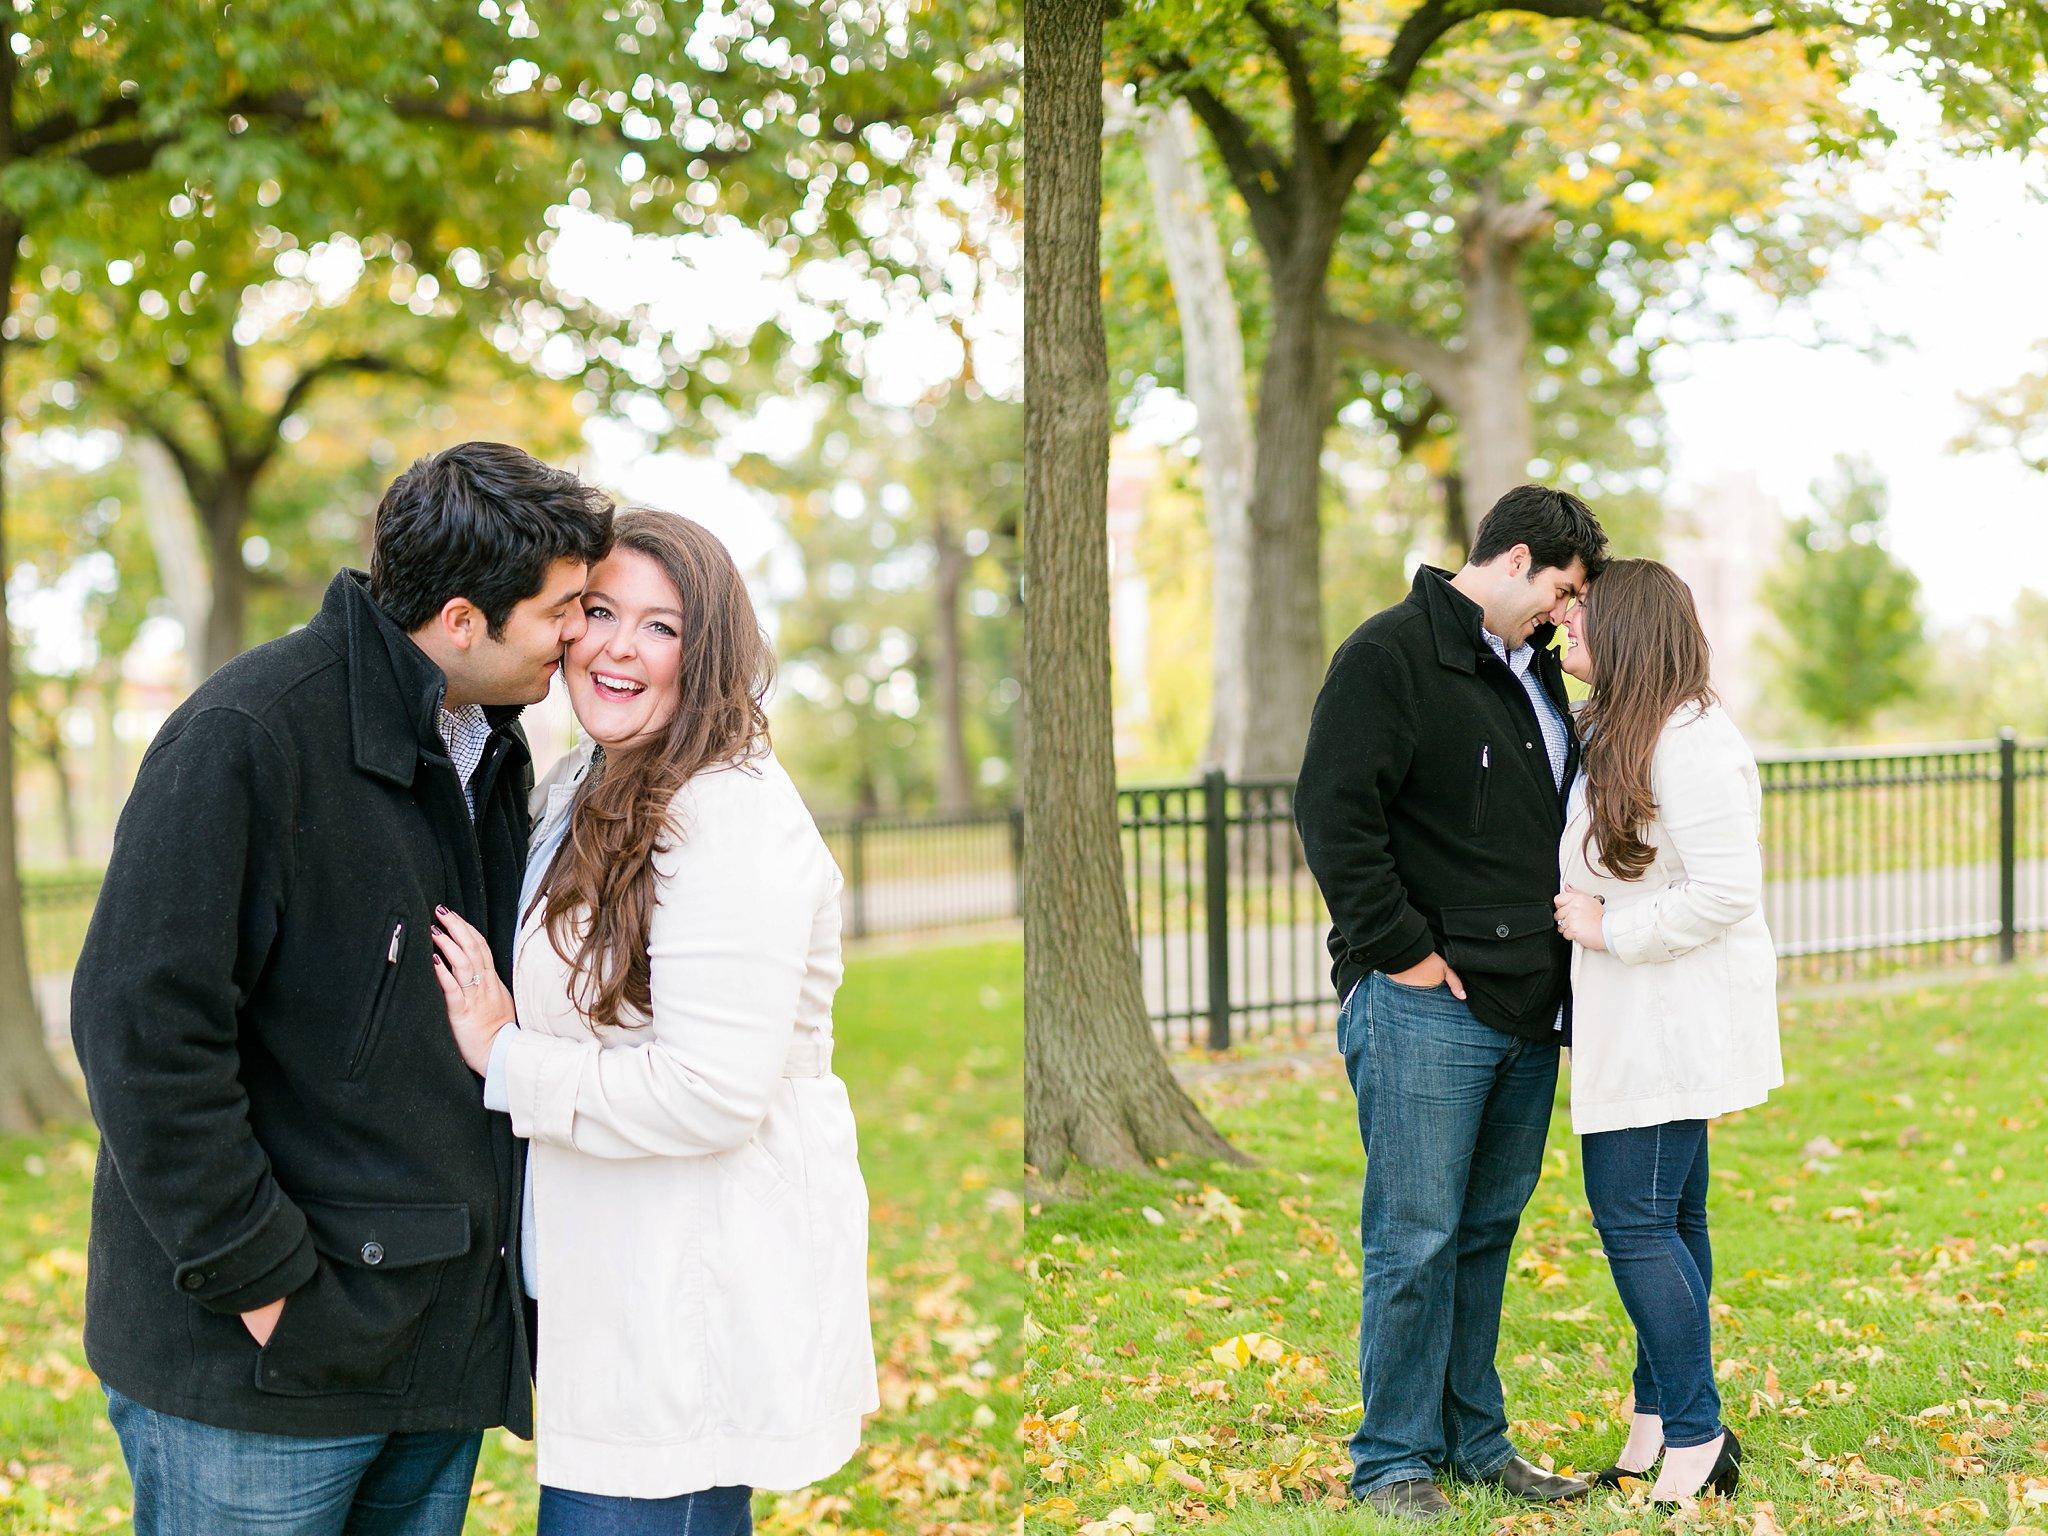 Baltimore Engagement Photos Fells Point Halie & Michael Megan Kelsey Photography-11.jpg